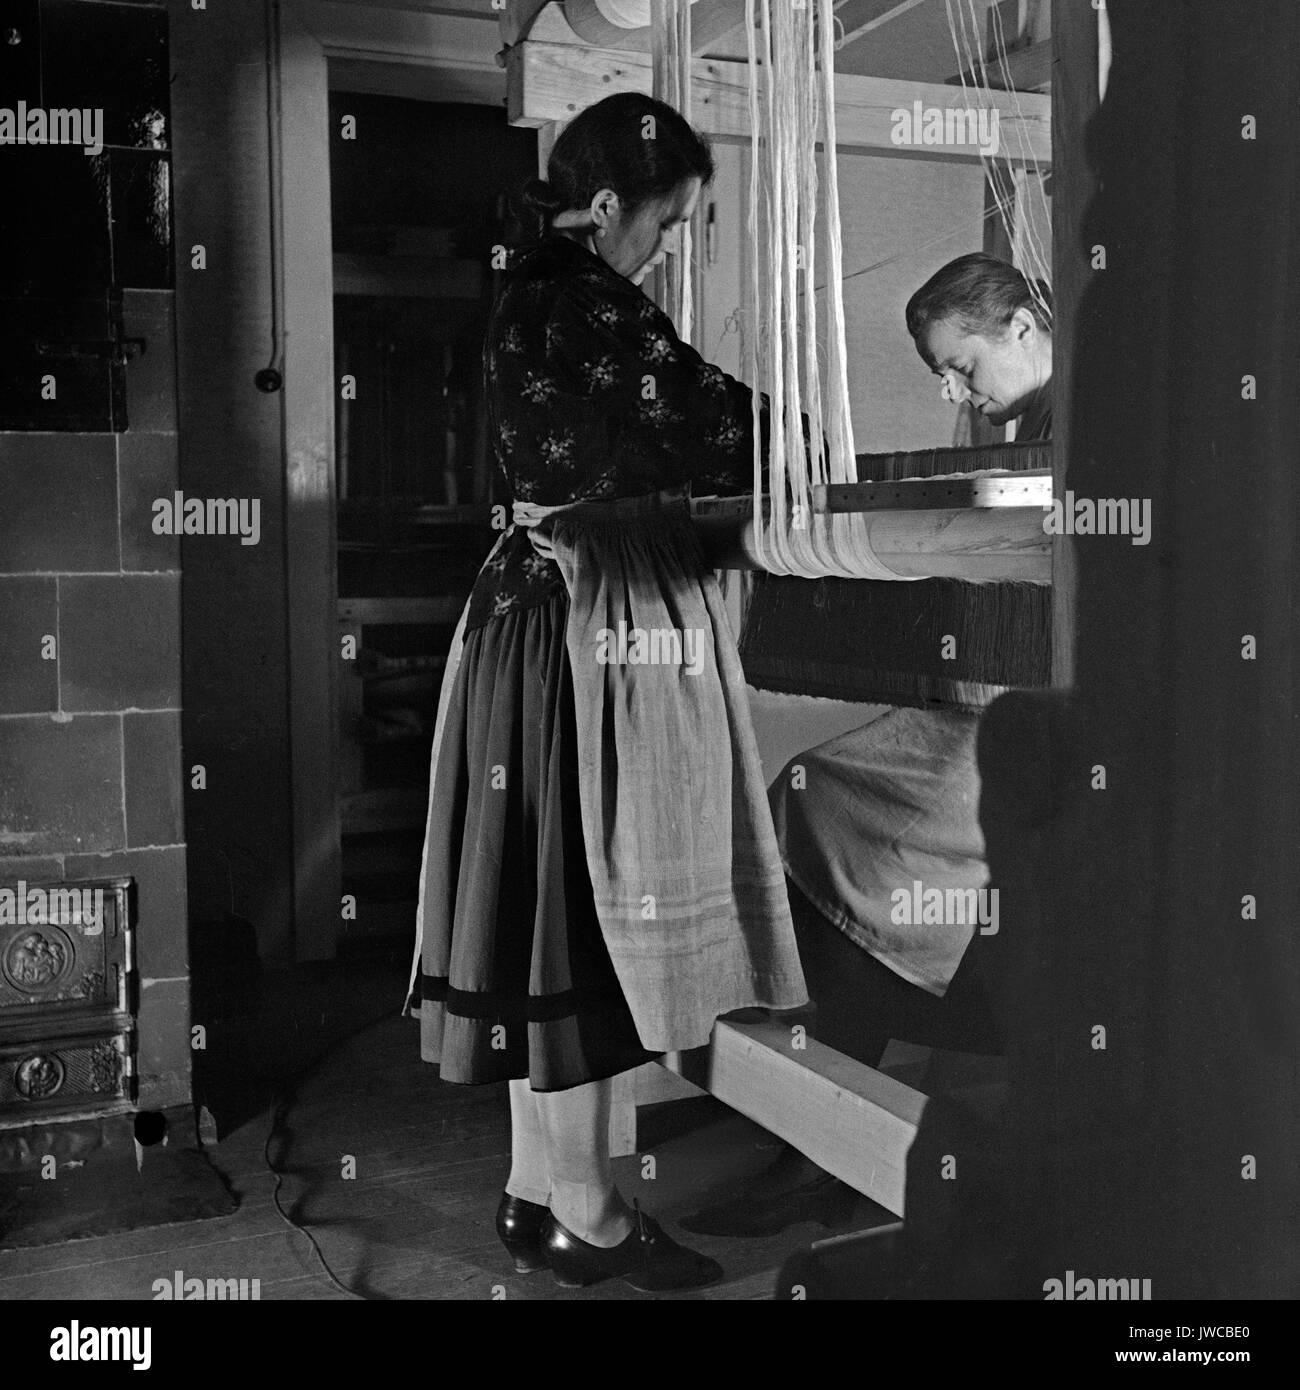 Two women weaving. - Stock Image